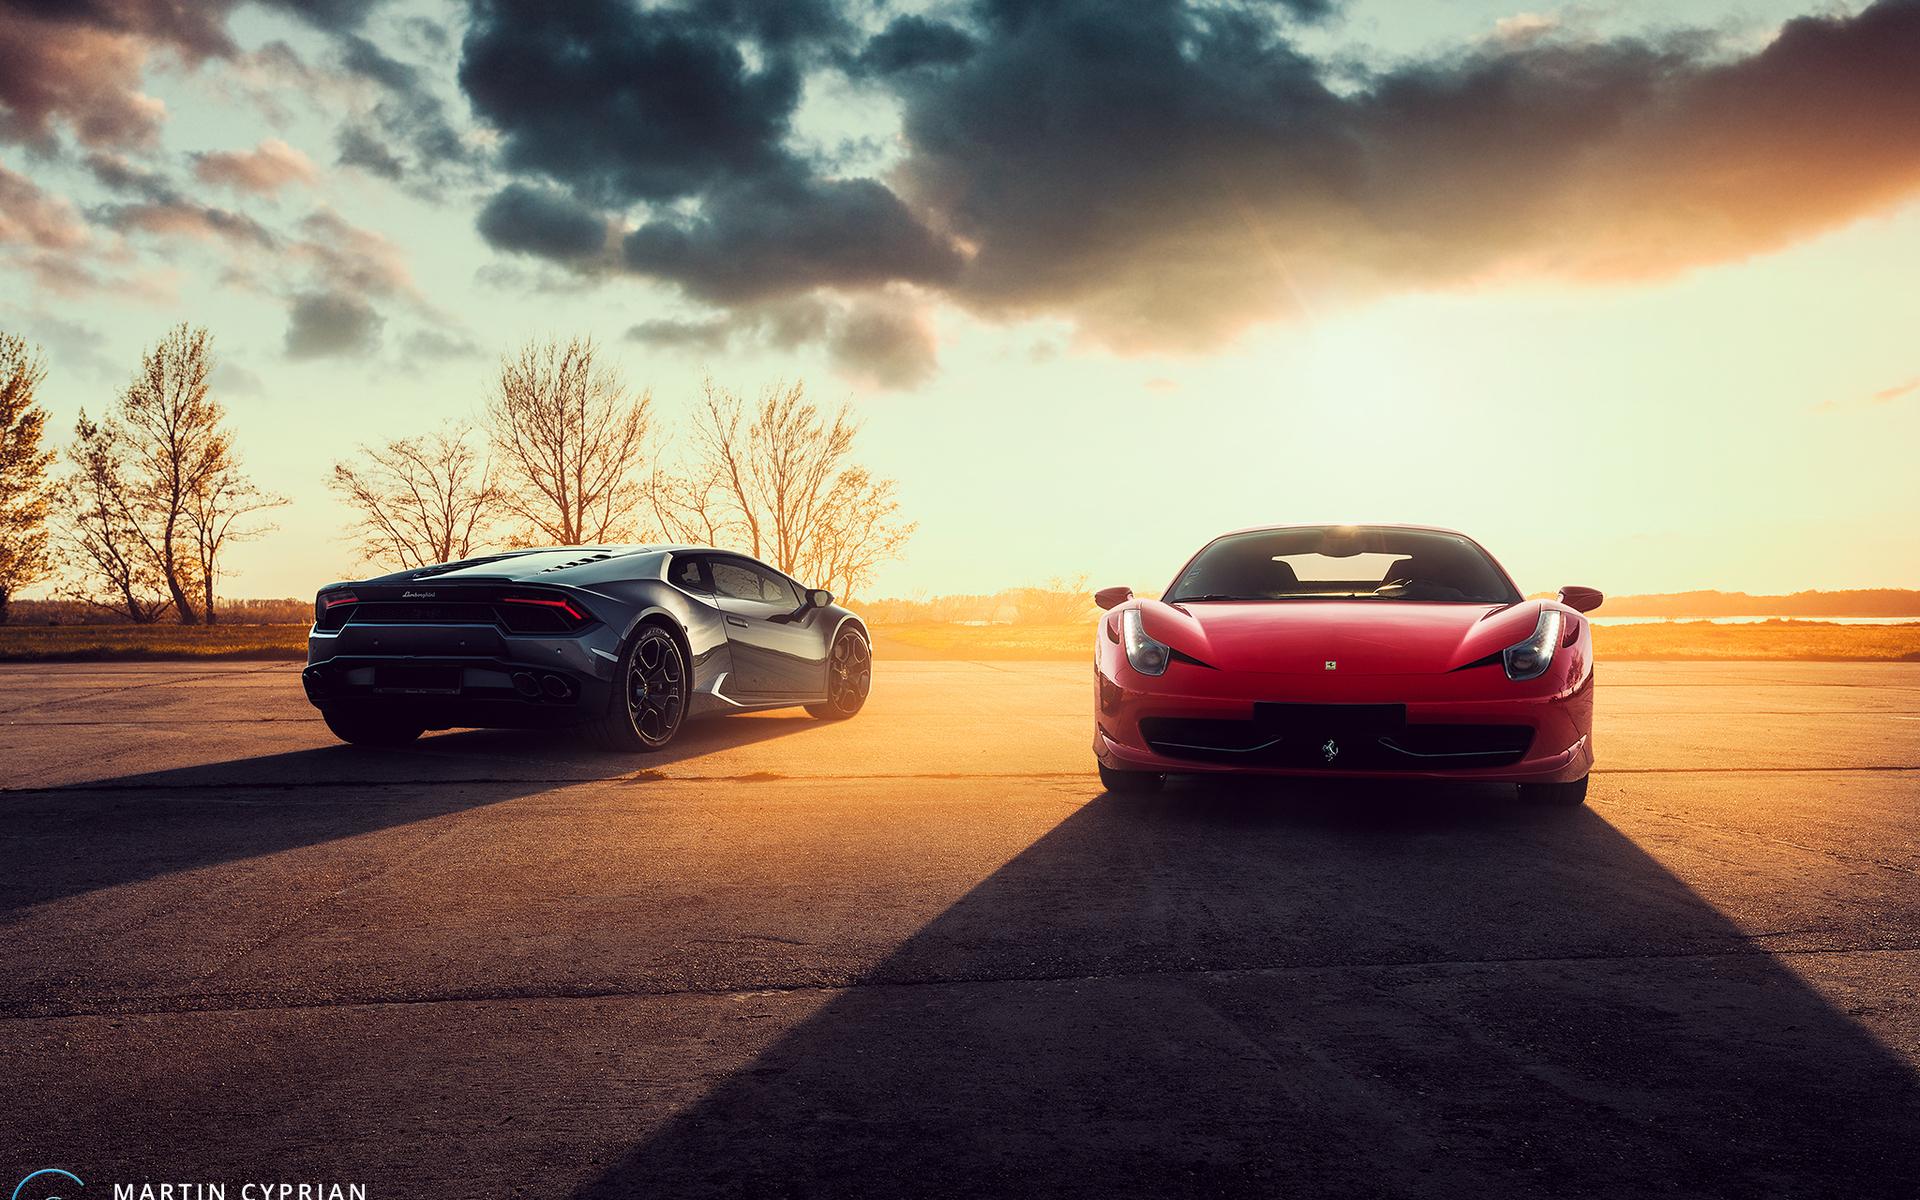 Black Lamborghini Huracan And Red Ferrari 458 Zs